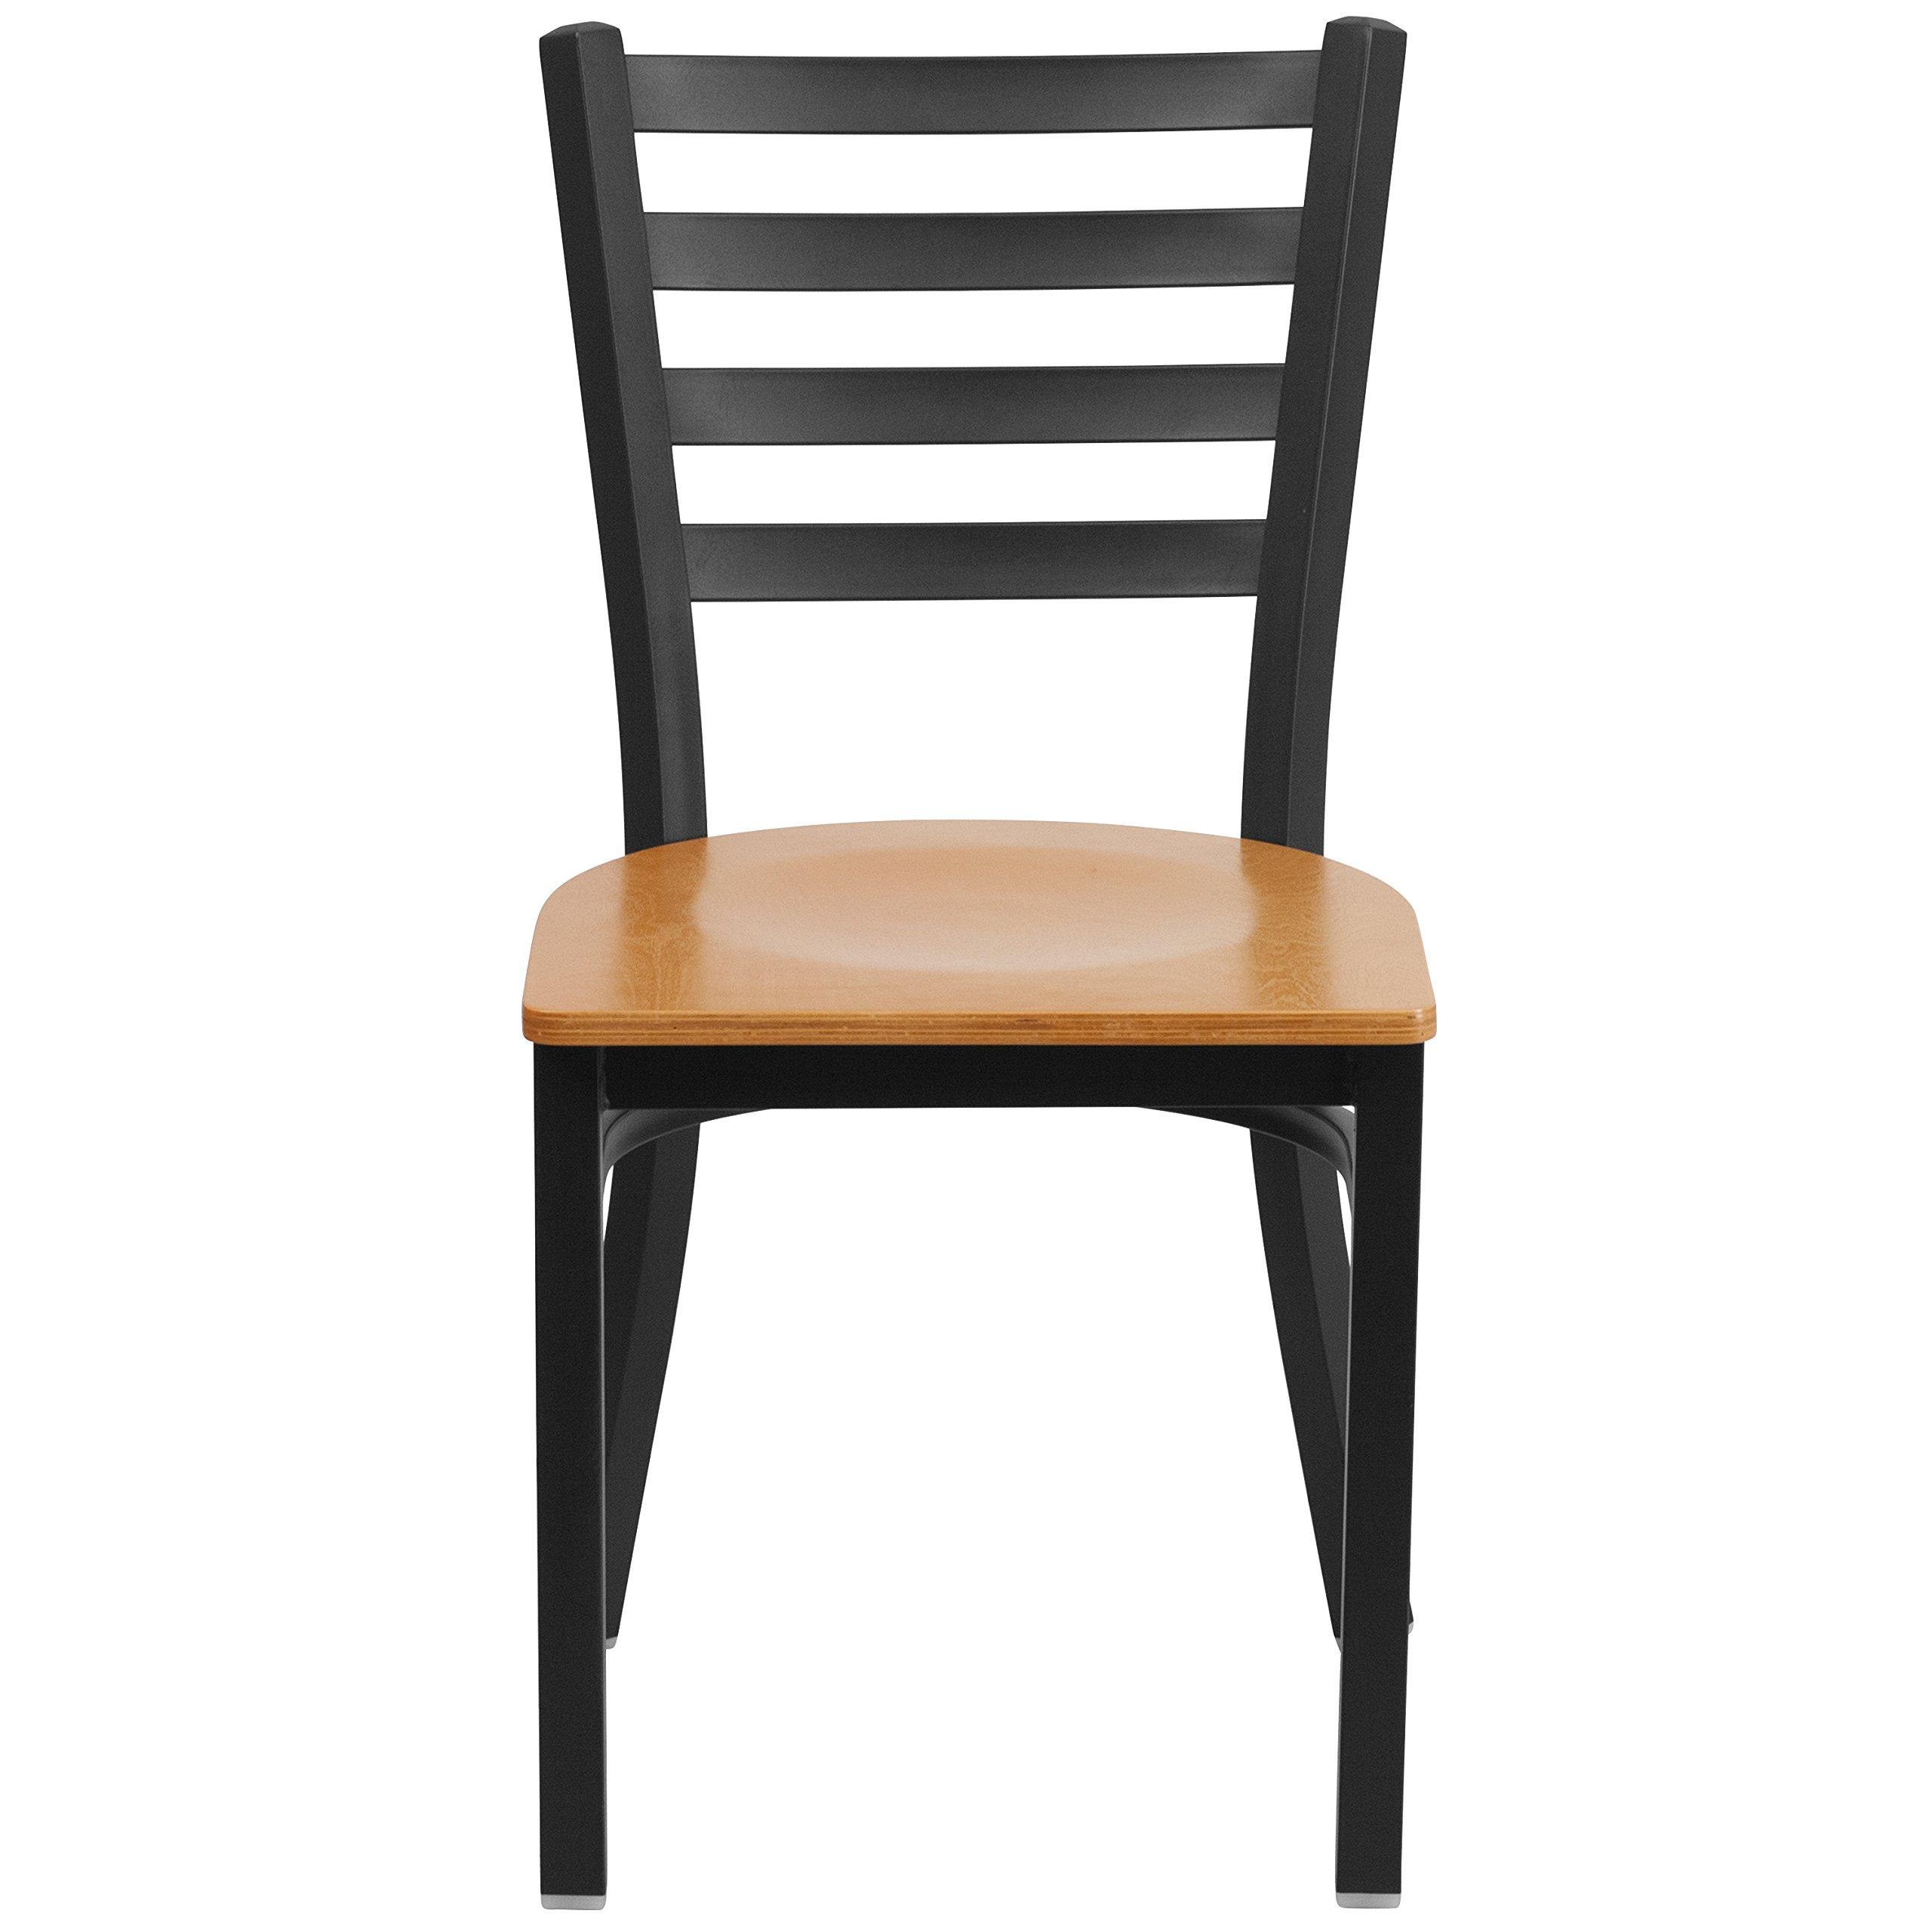 Flash Furniture HERCULES Series Black Ladder Back Metal Restaurant Chair - Natural Wood Seat by Flash Furniture (Image #4)